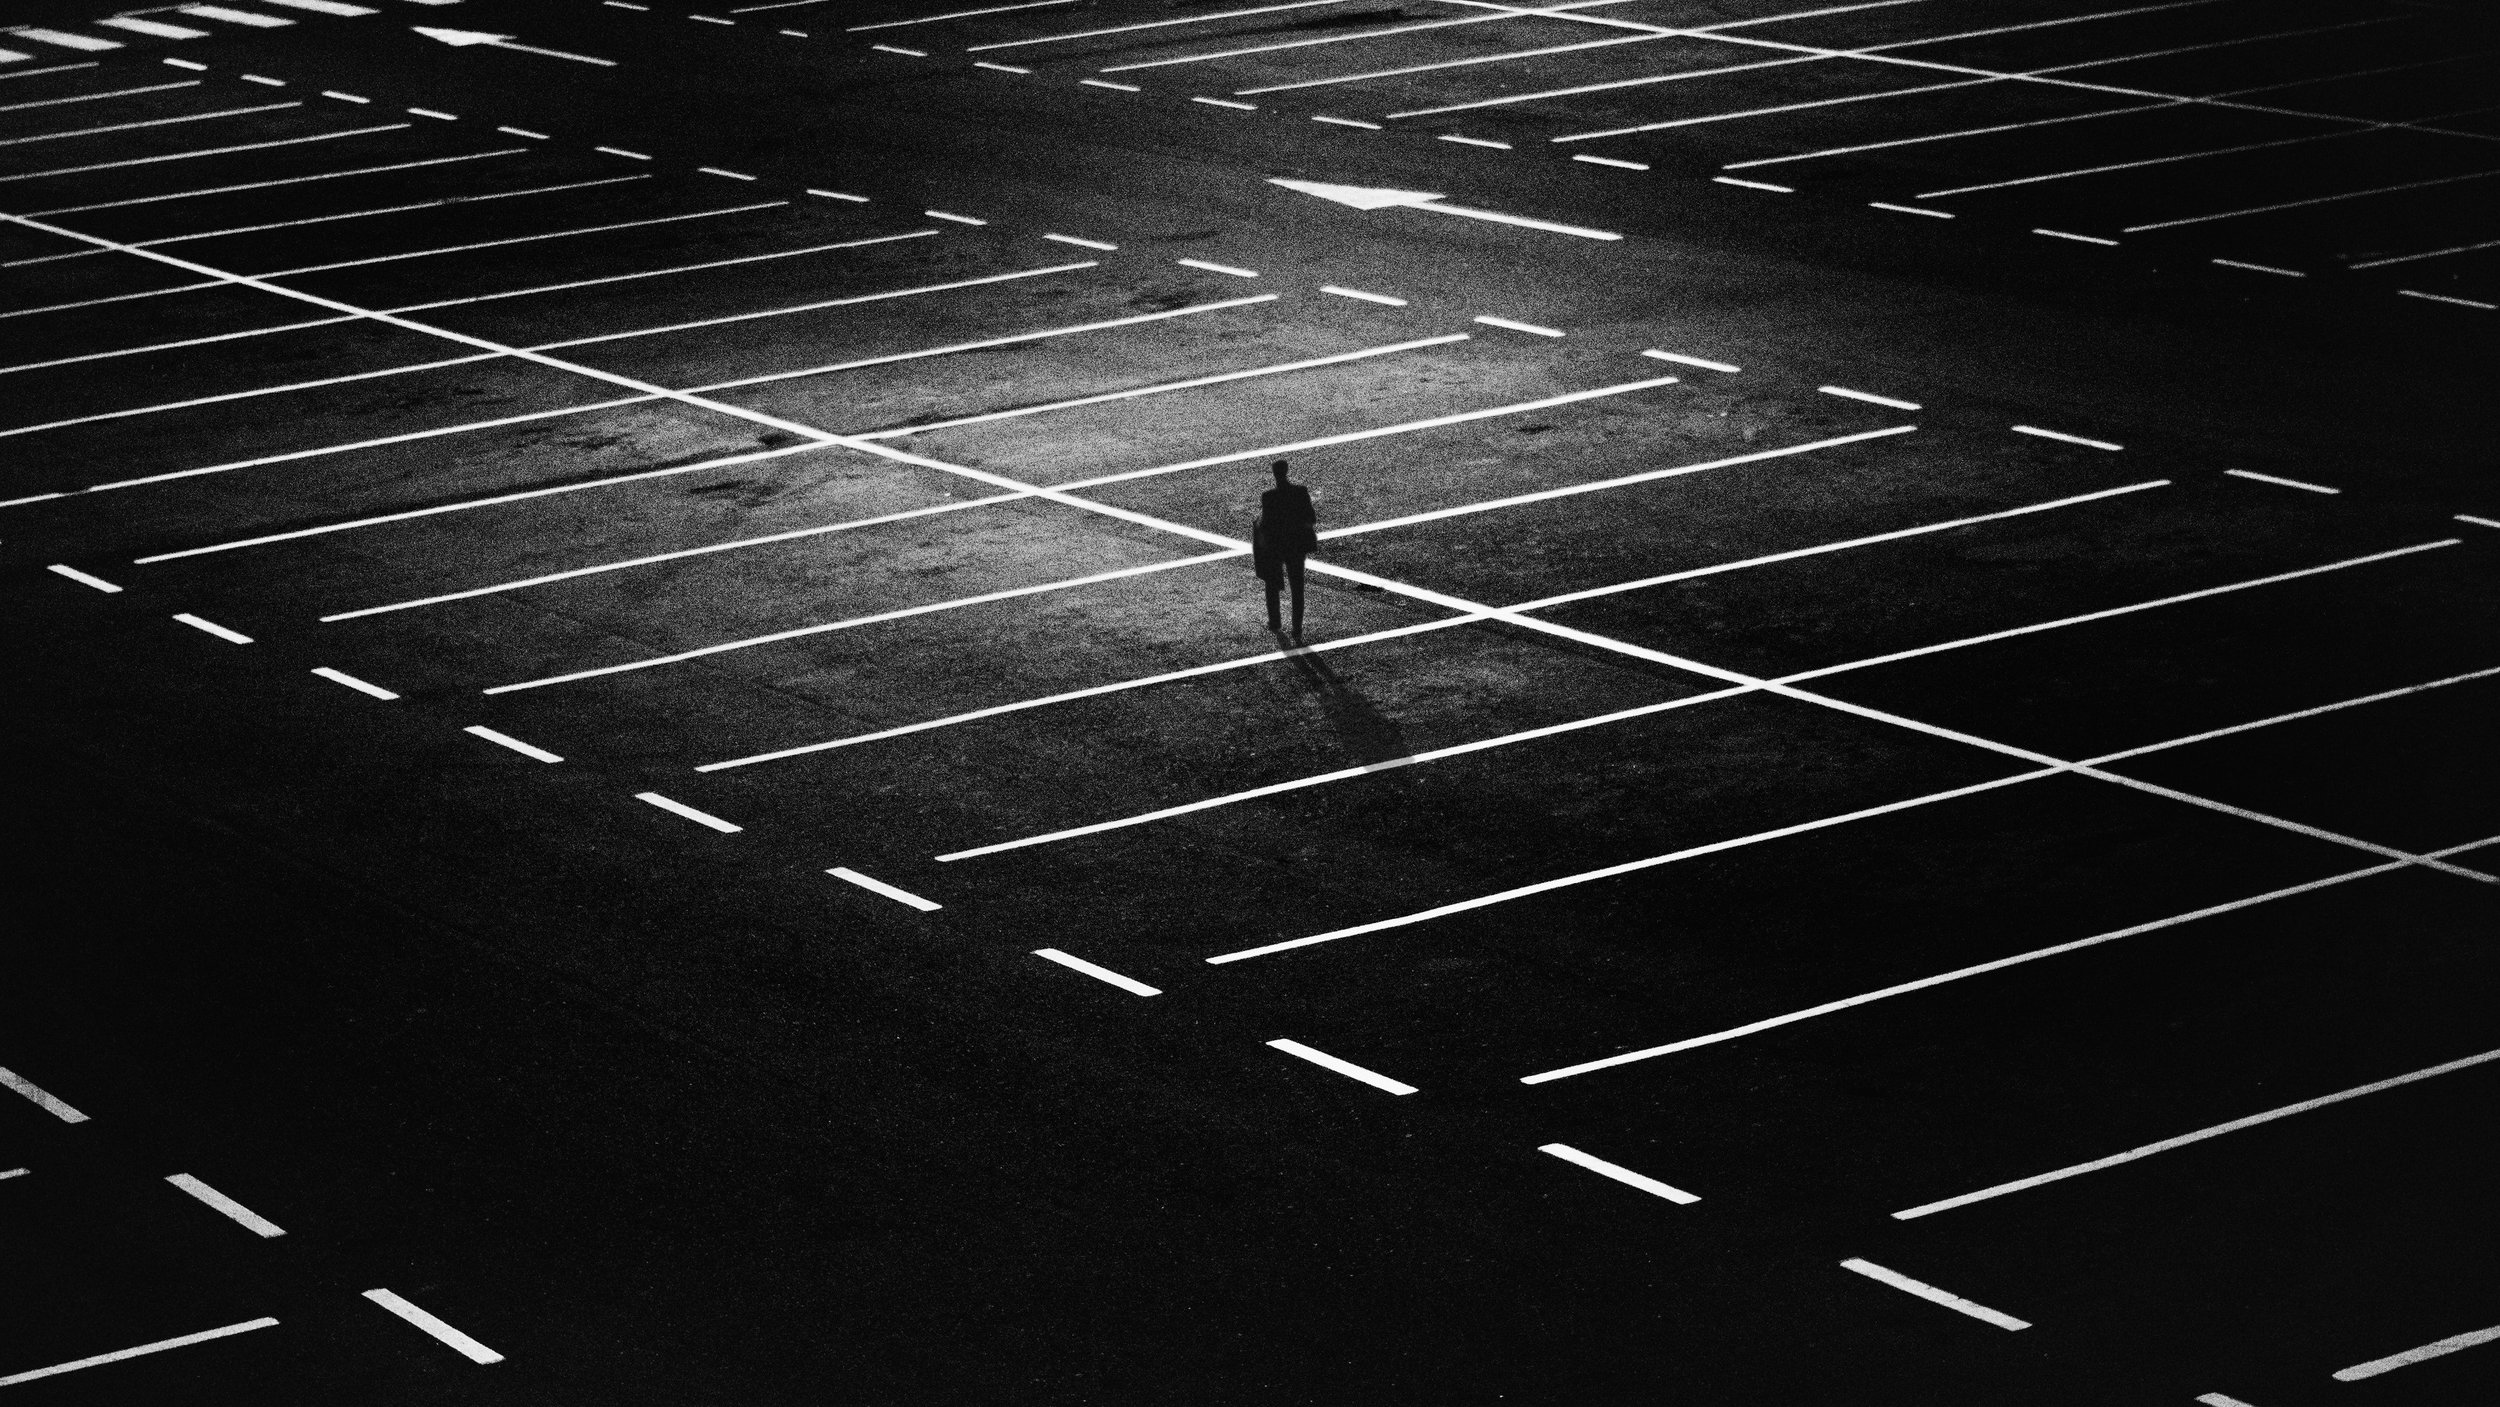 alone-black-and-white-dark-163772.jpg